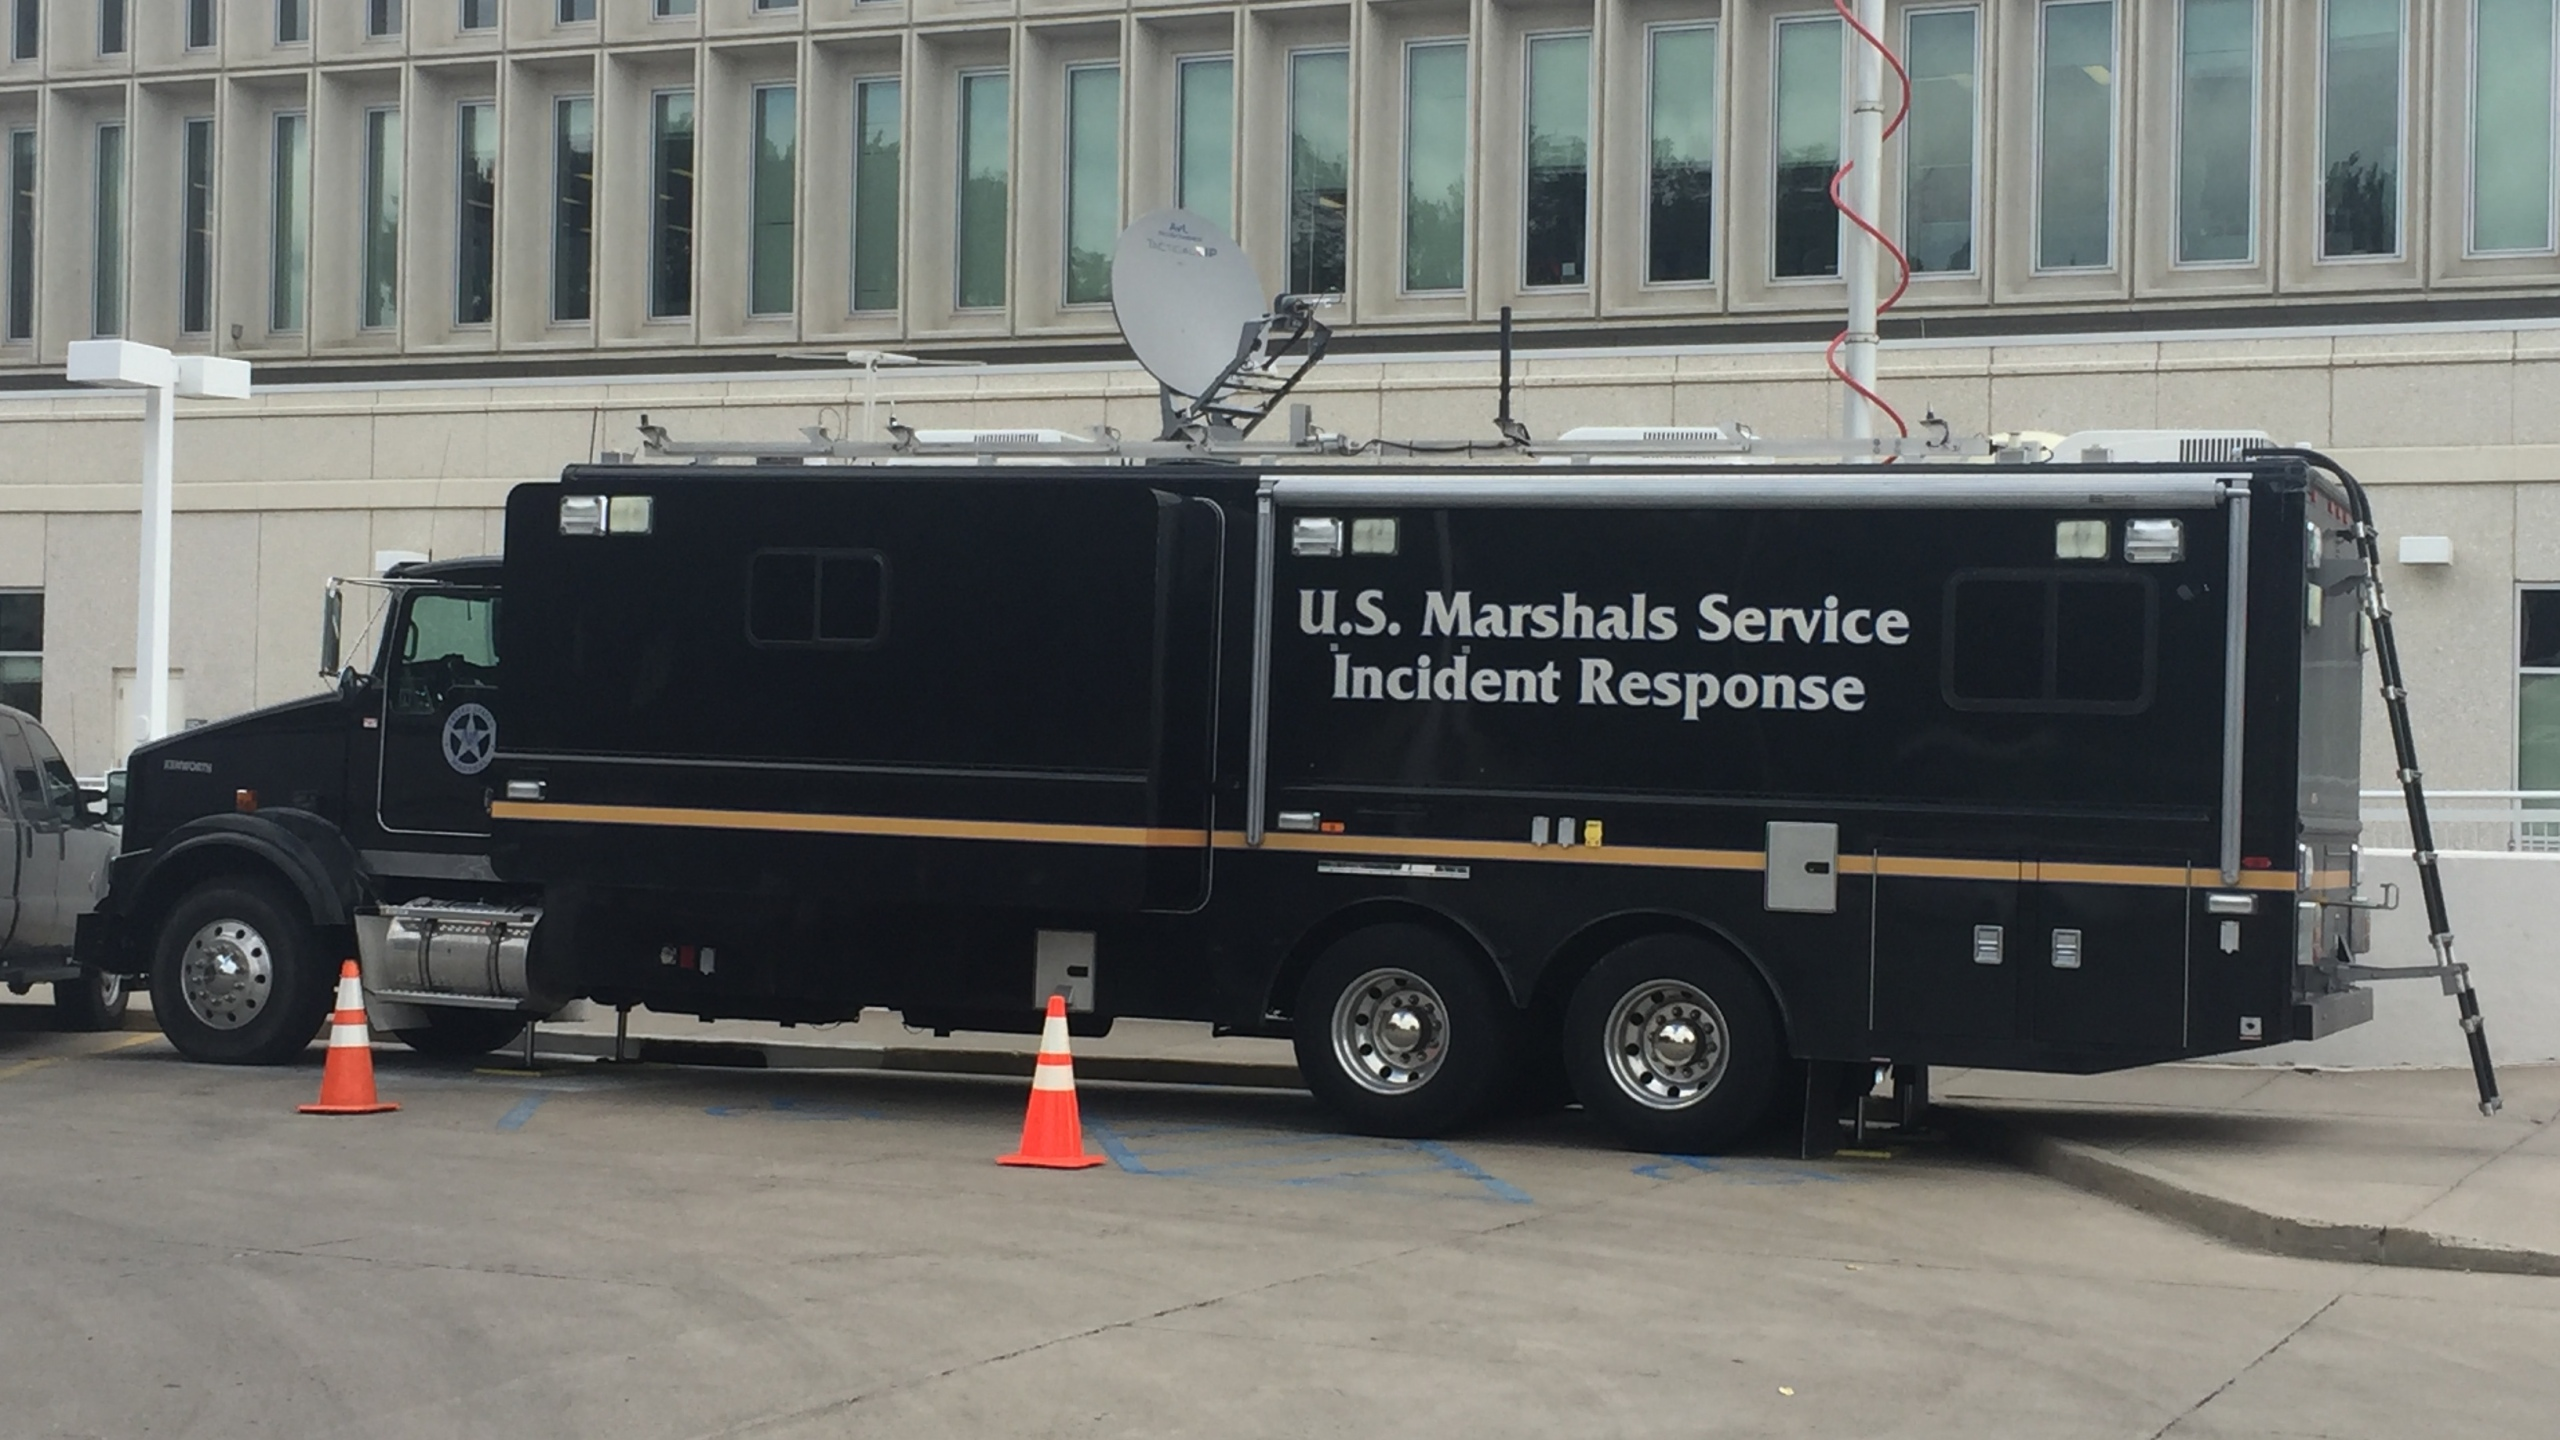 U.S. Marshals Incident response_1472063816910.jpg